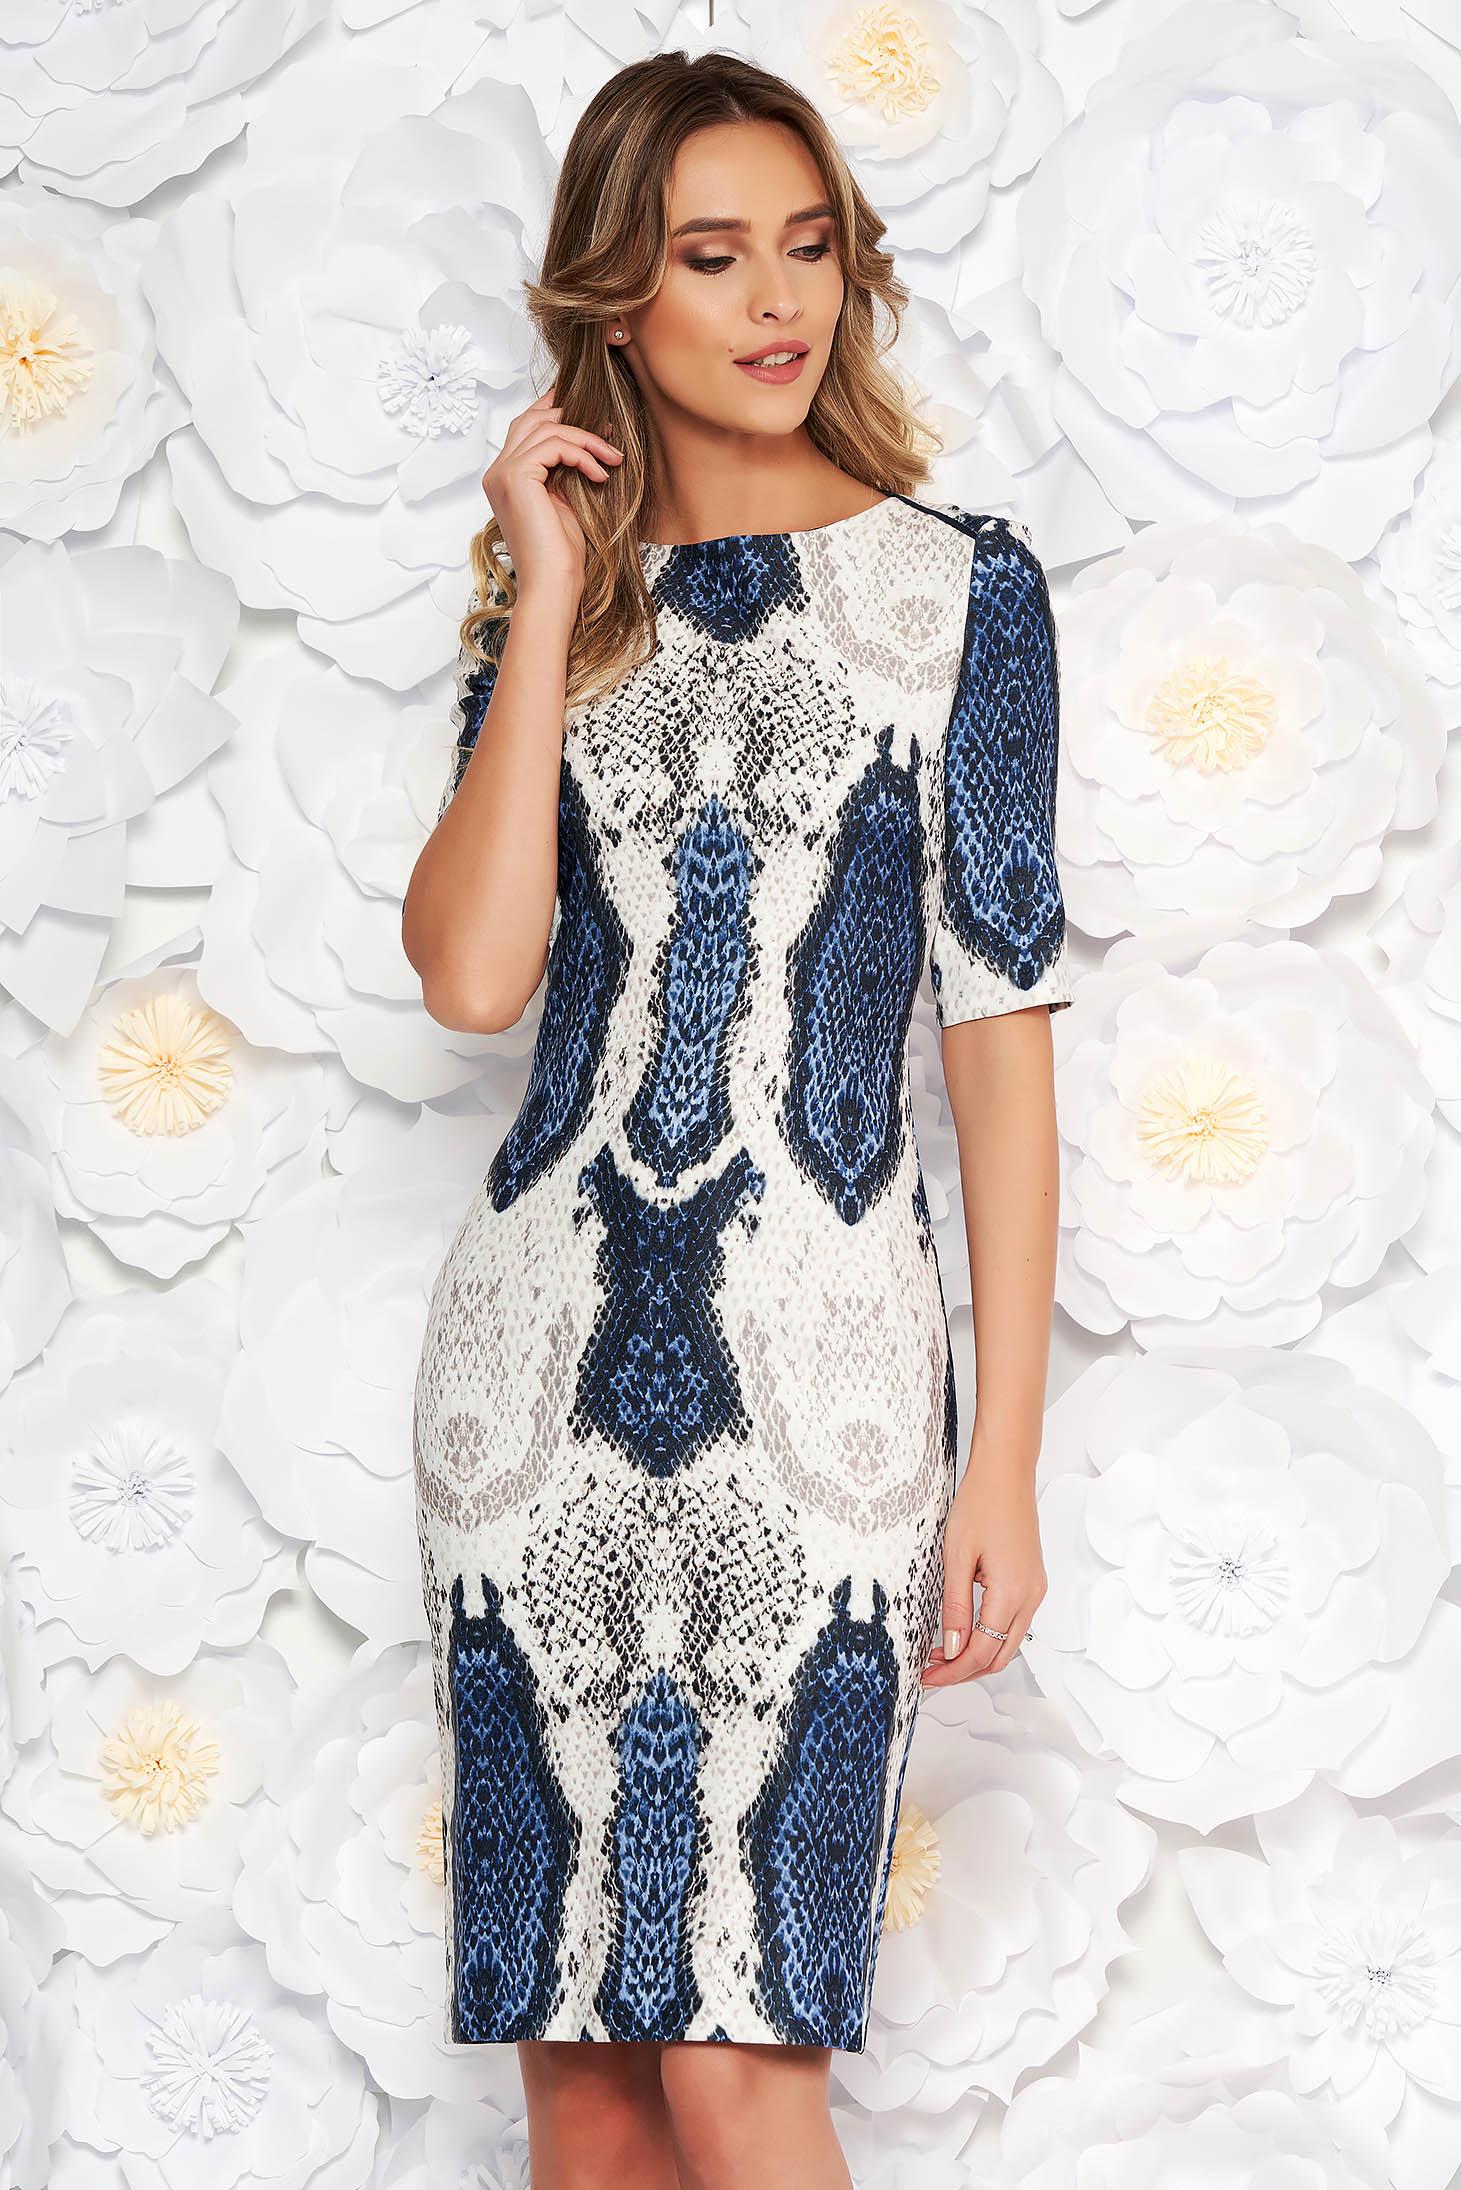 Rochie albastru-inchis eleganta de zi tip creion din material fin la atingere animal print